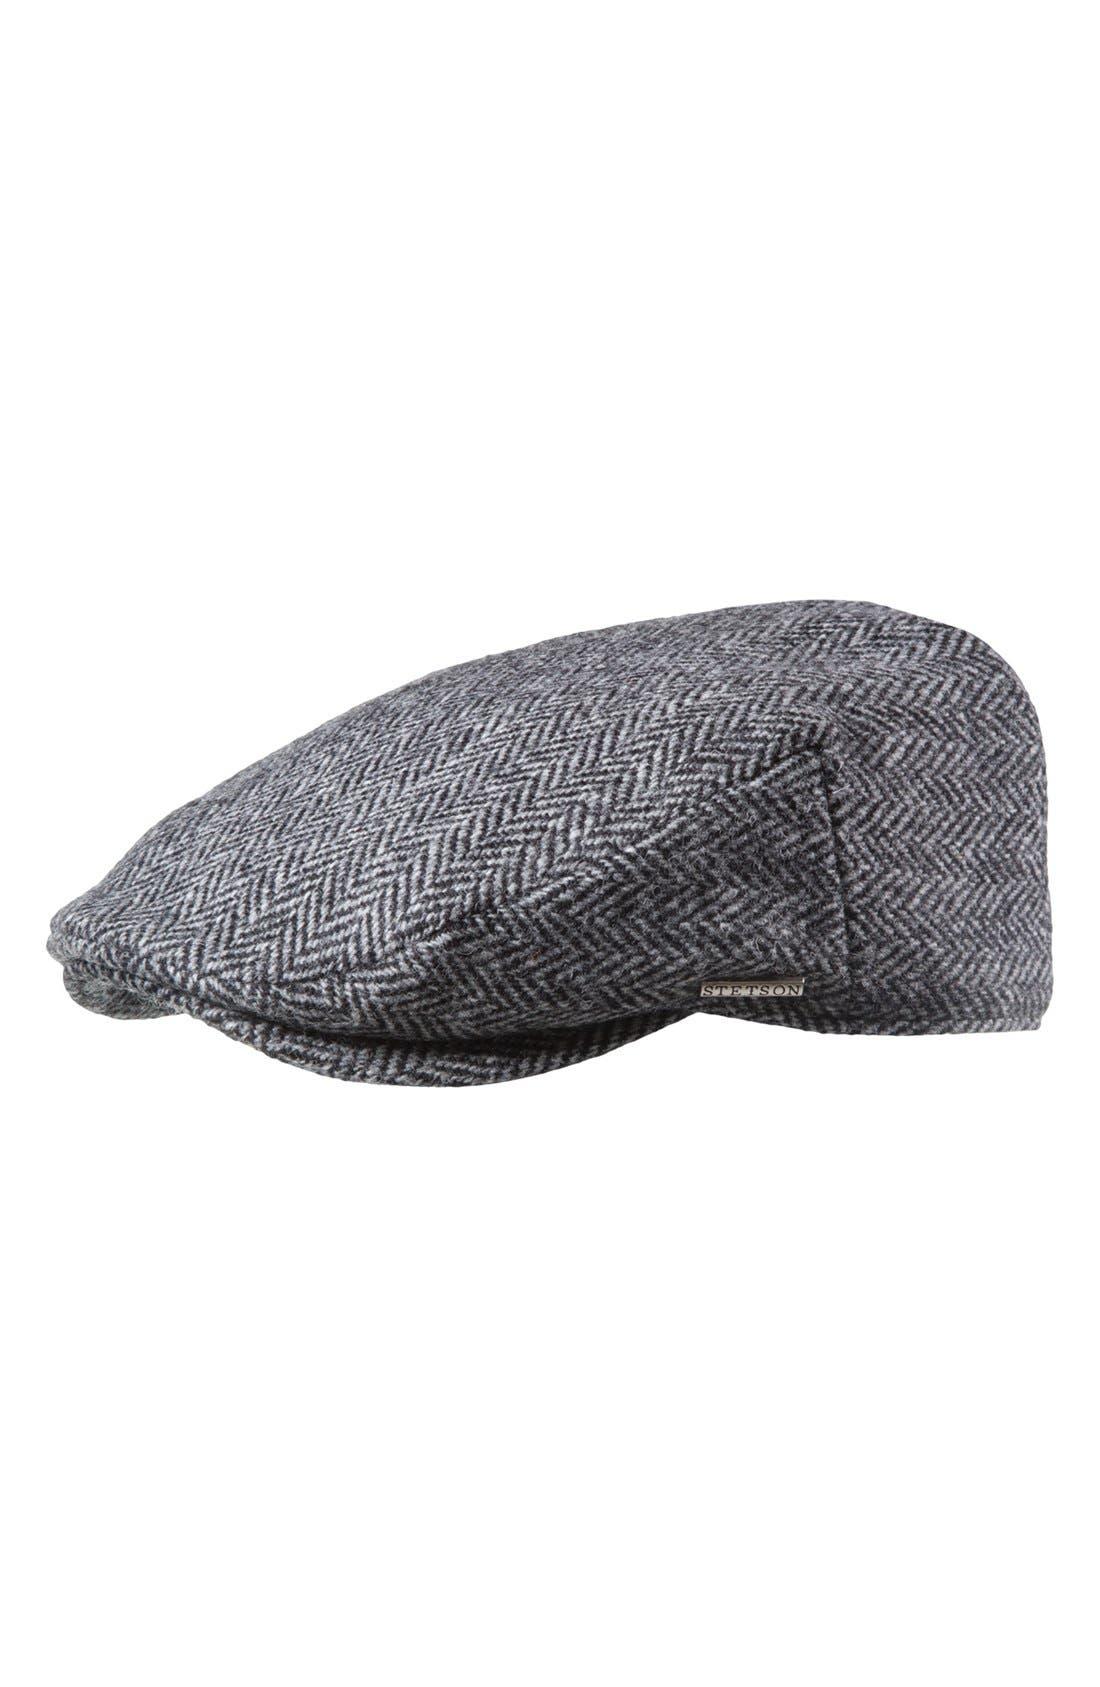 Main Image - Stetson Harris Tweed Driving Cap